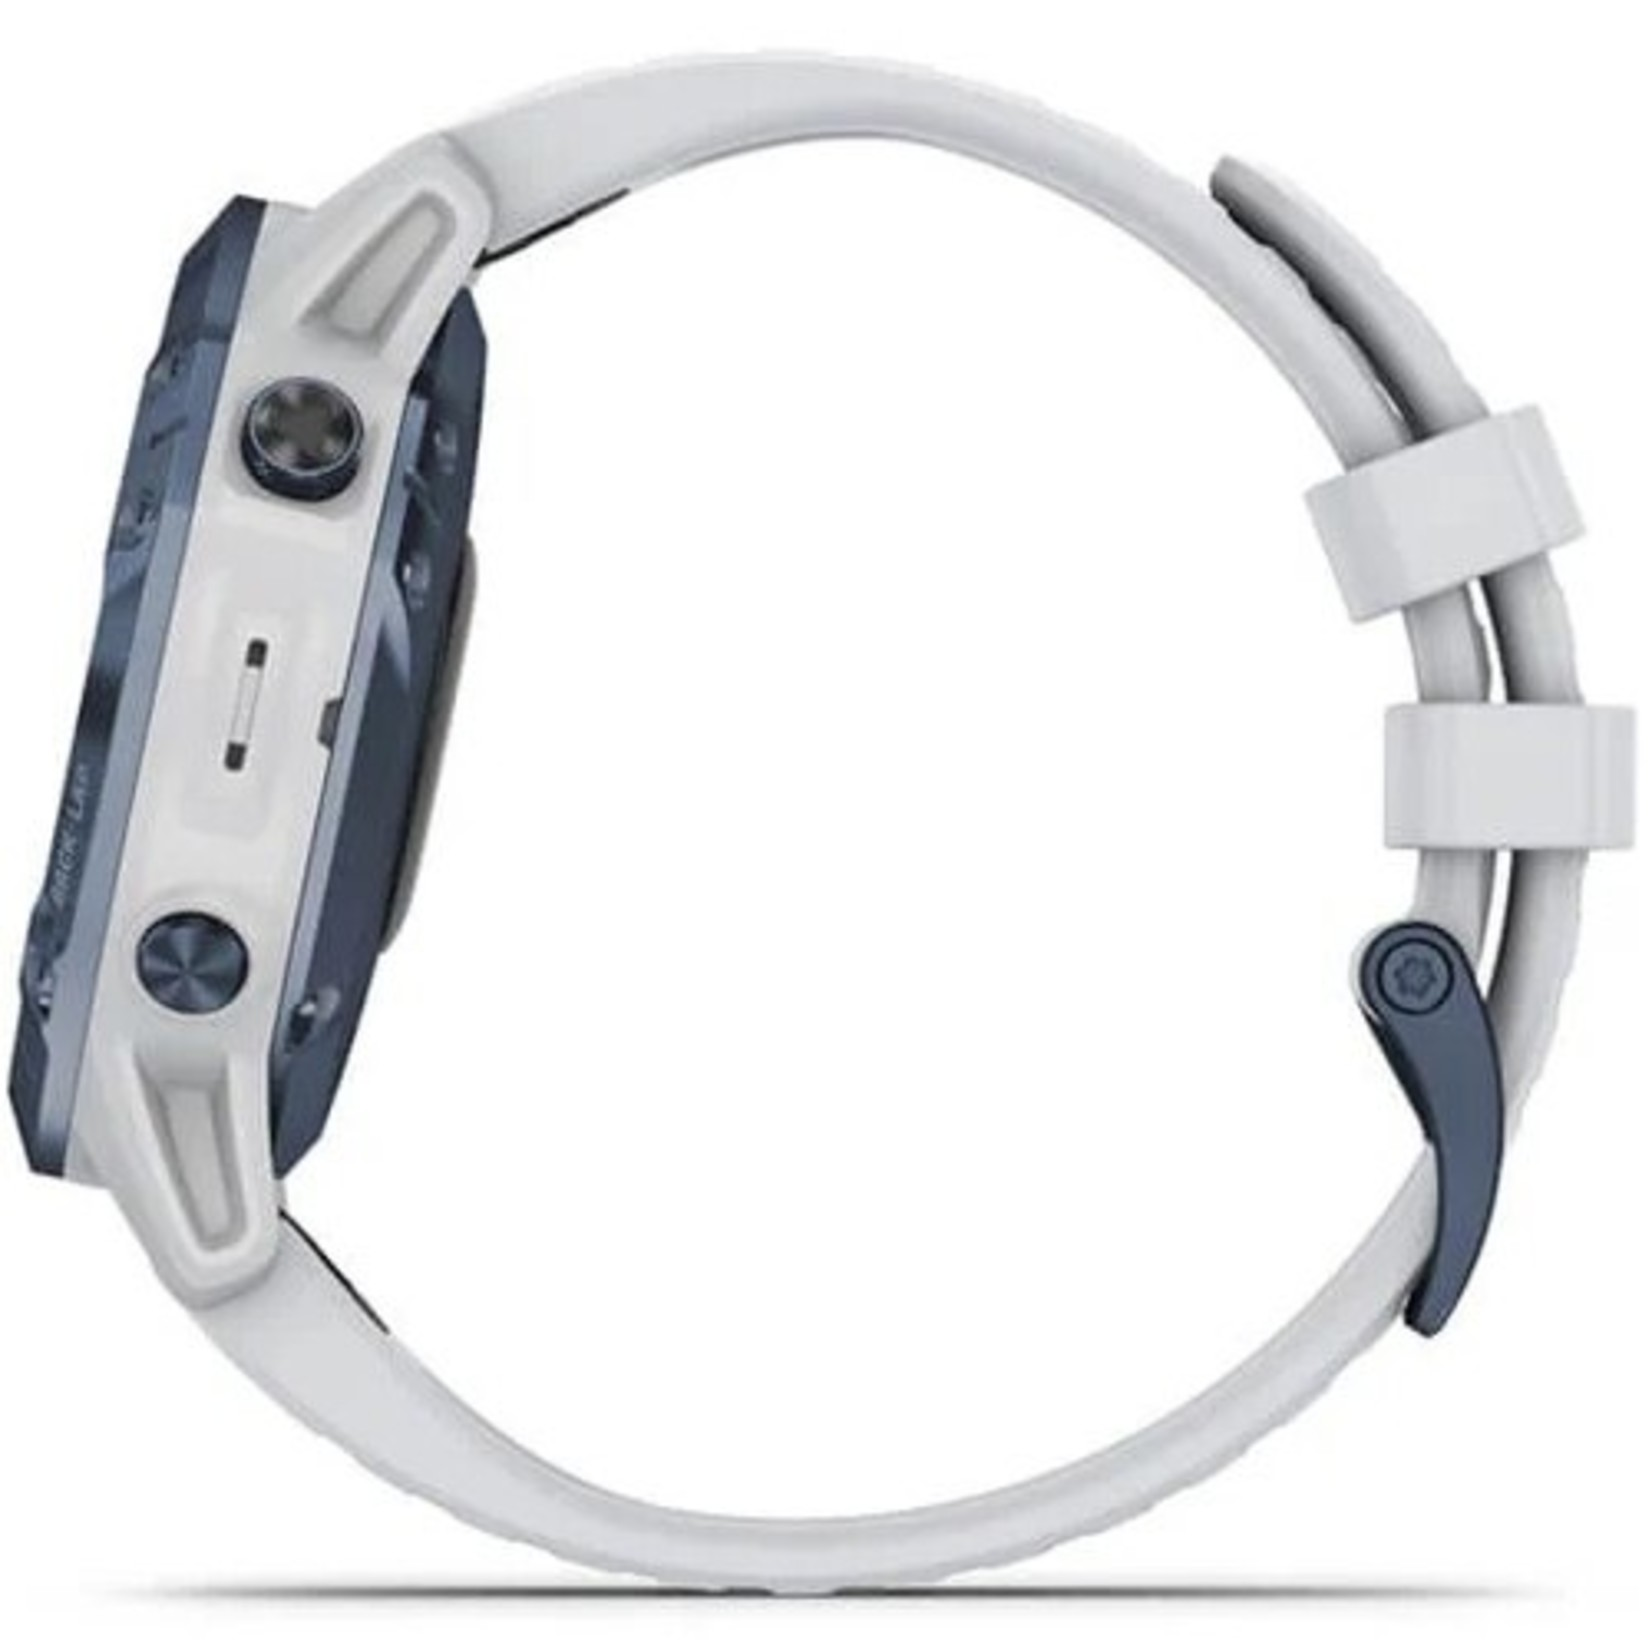 Garmin fēnix® 6 - Pro Solar Edition Mineral Blue Titanium with Whitestone Band